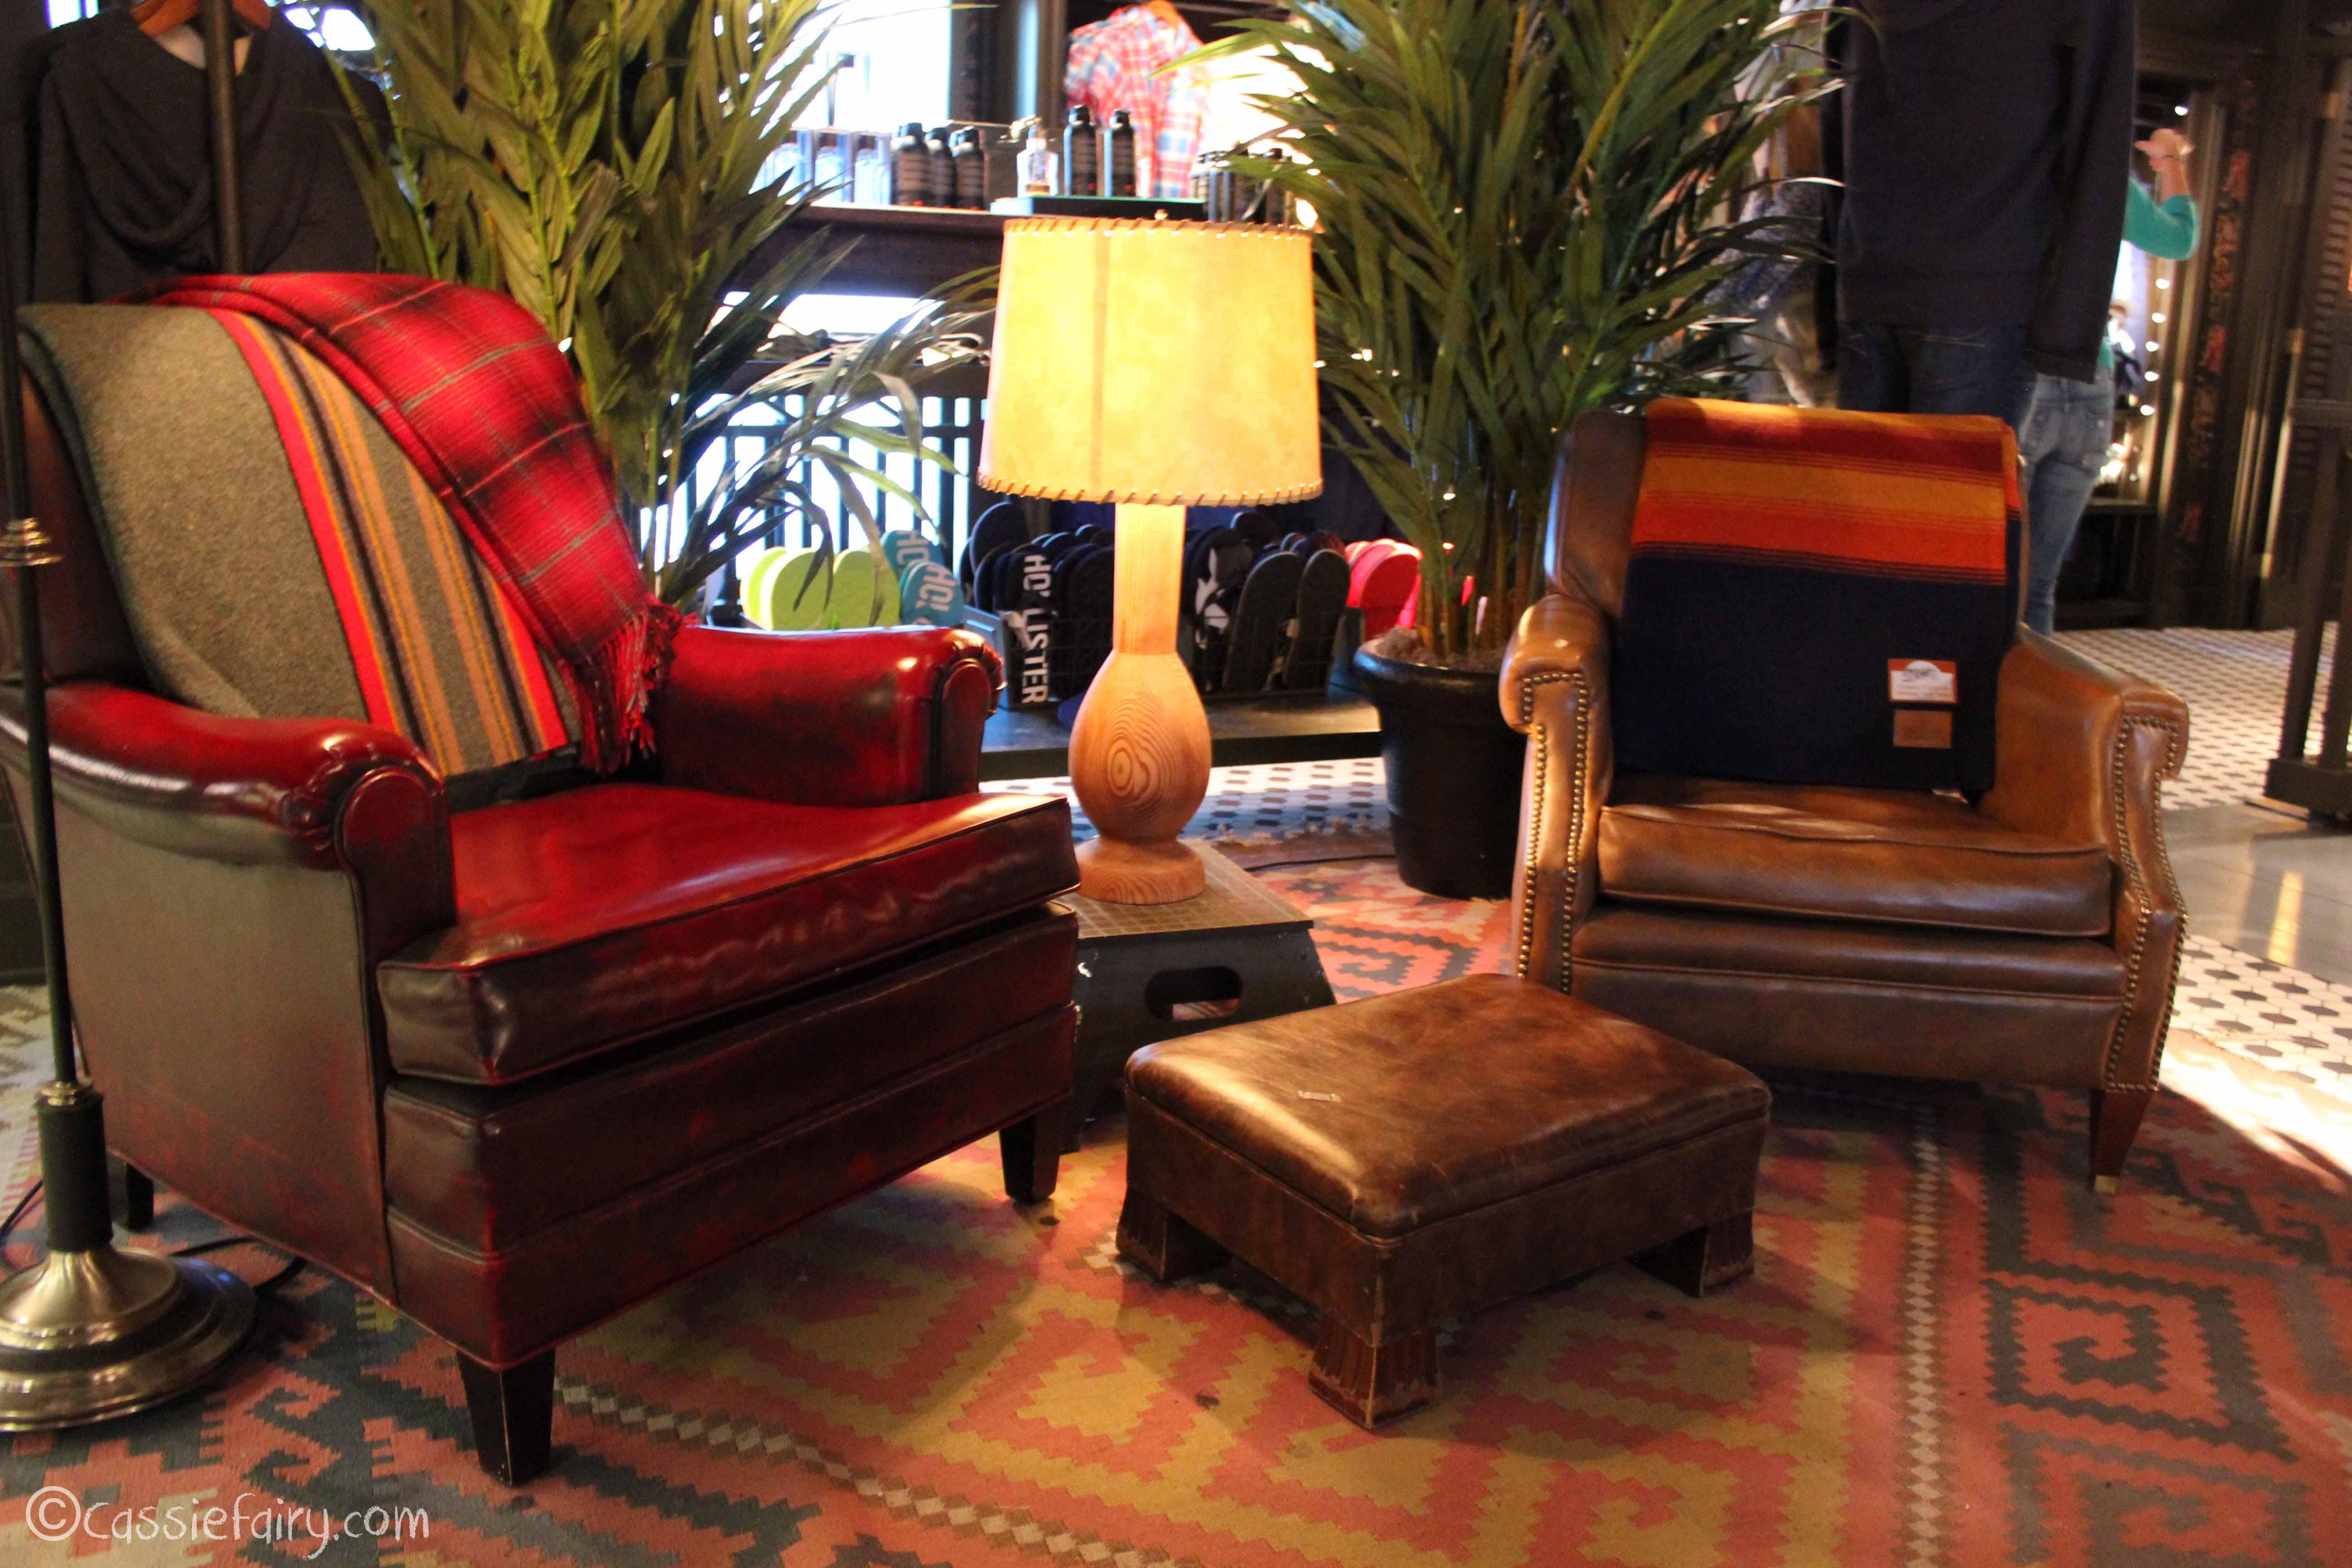 Hollister store interior design inspiration my thrifty for Hollister design